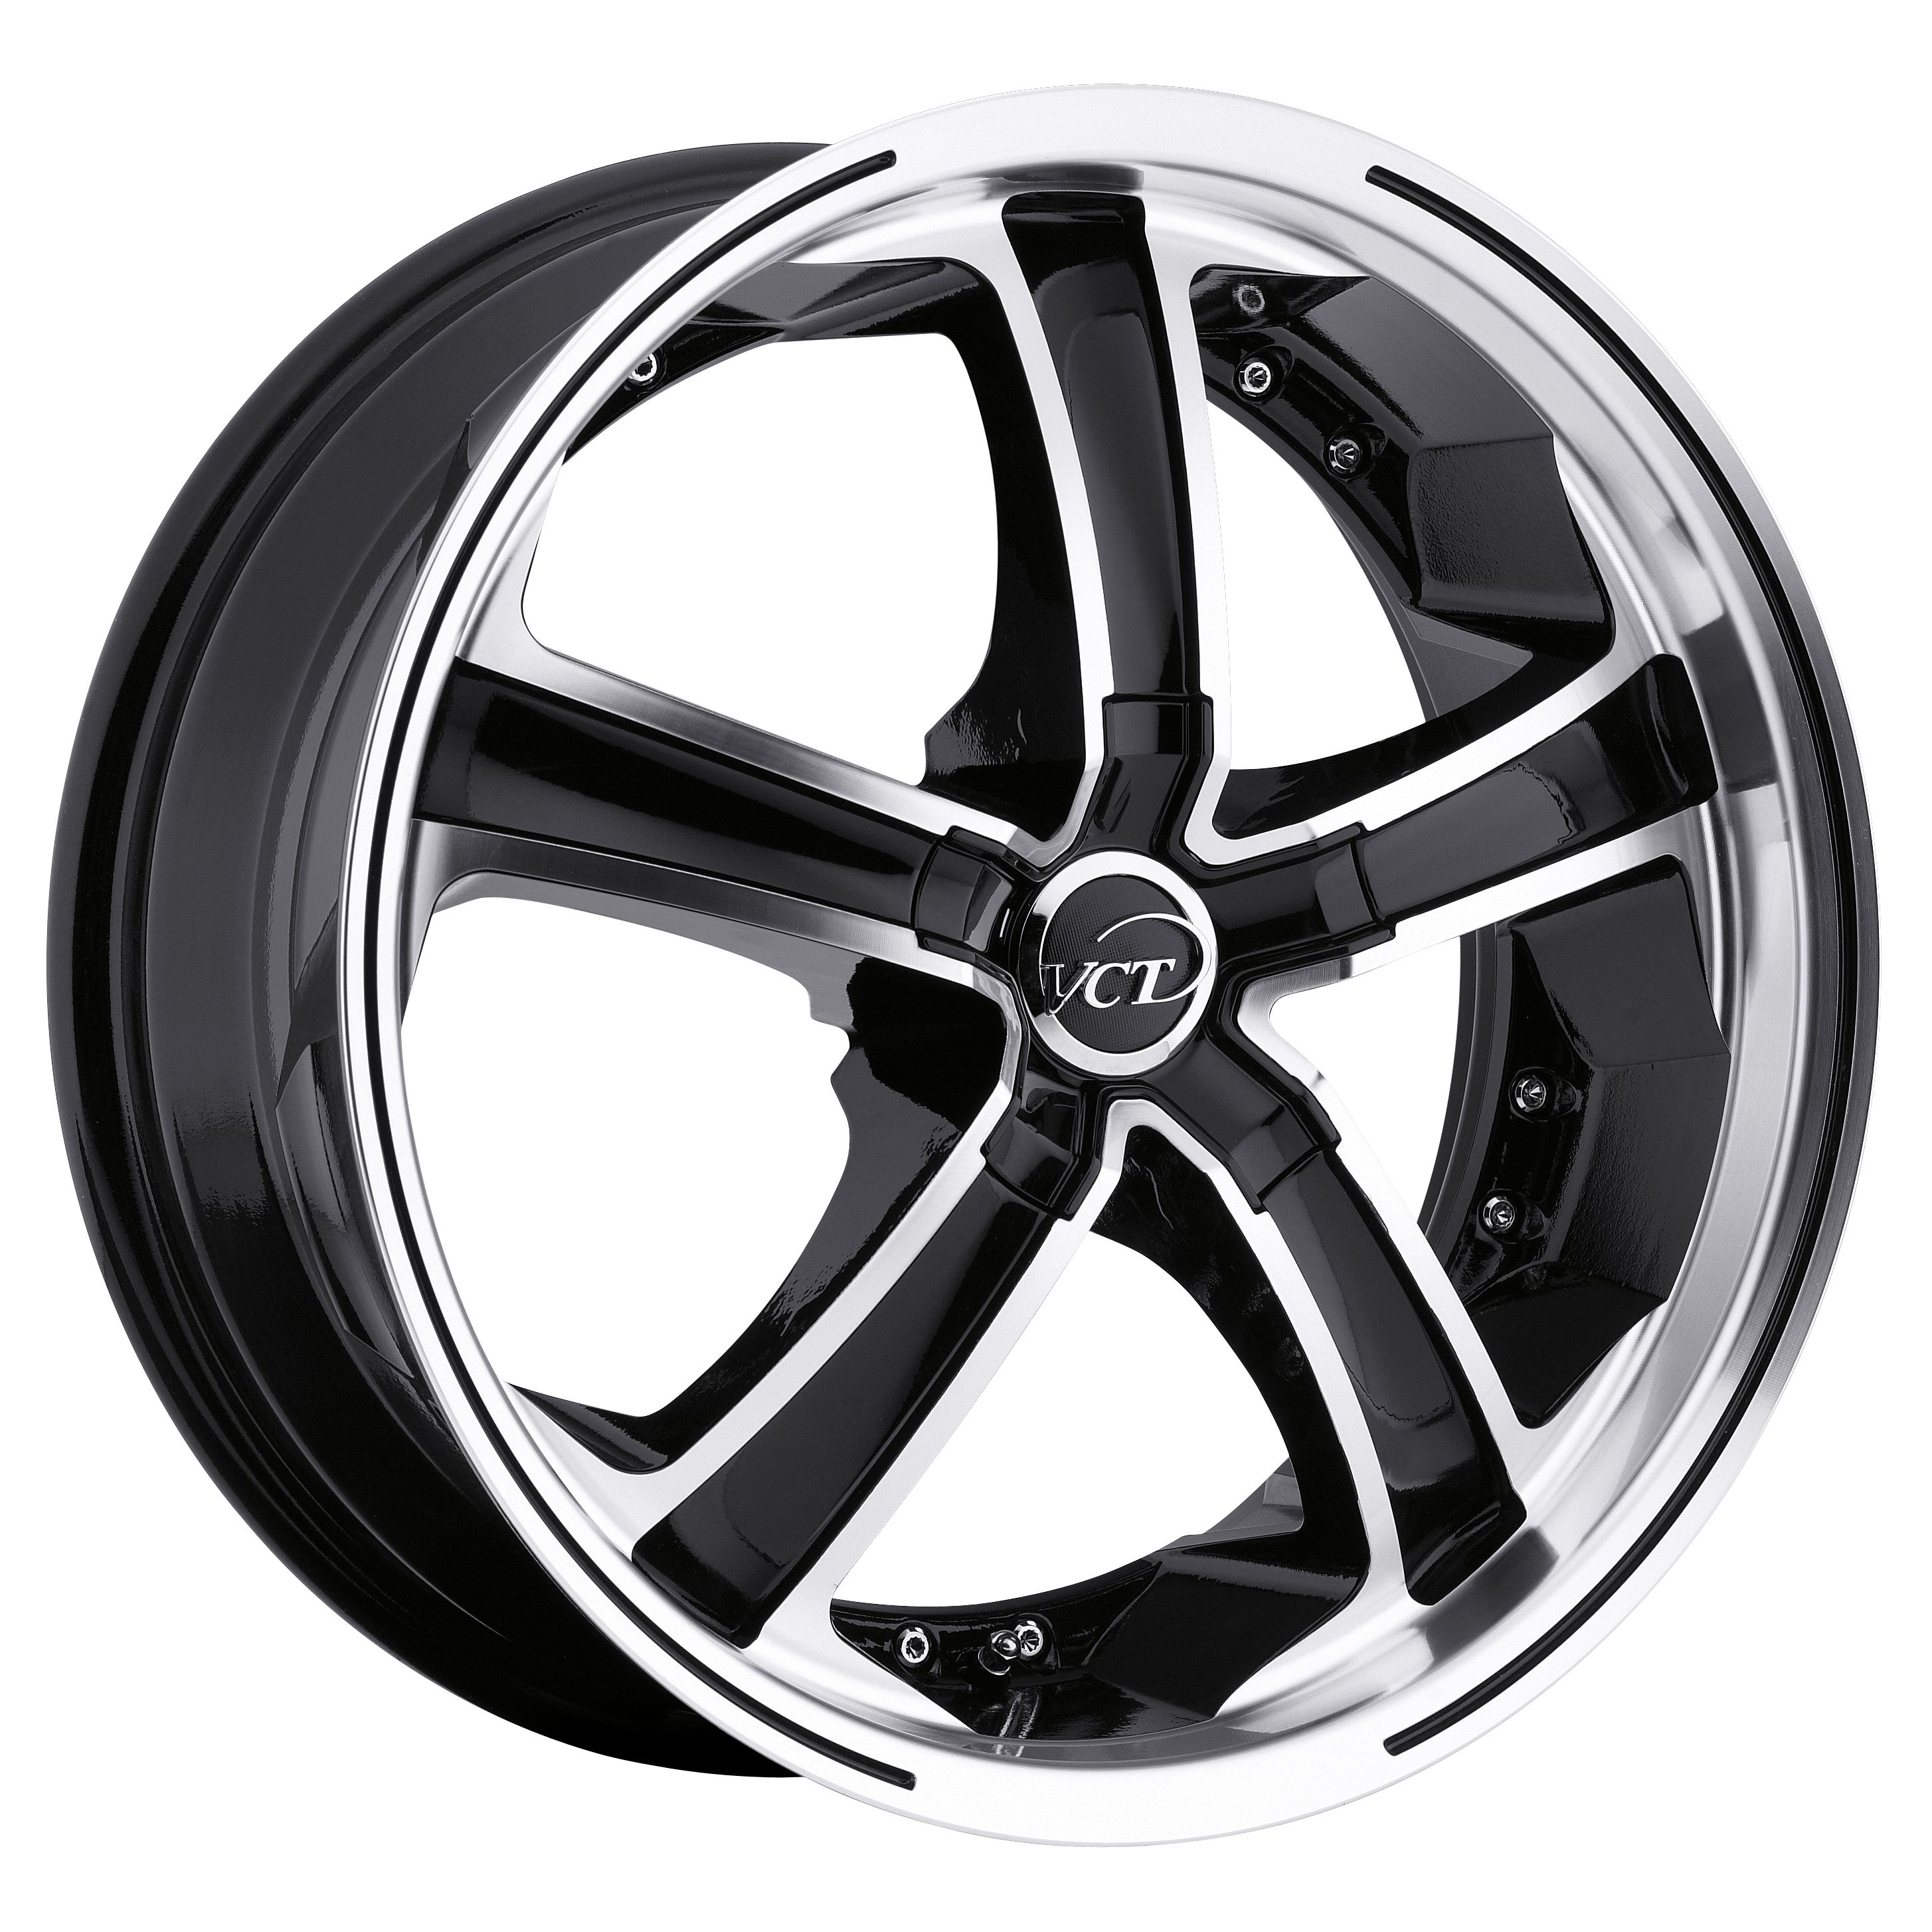 VCT Wheels Massino Black/Machined